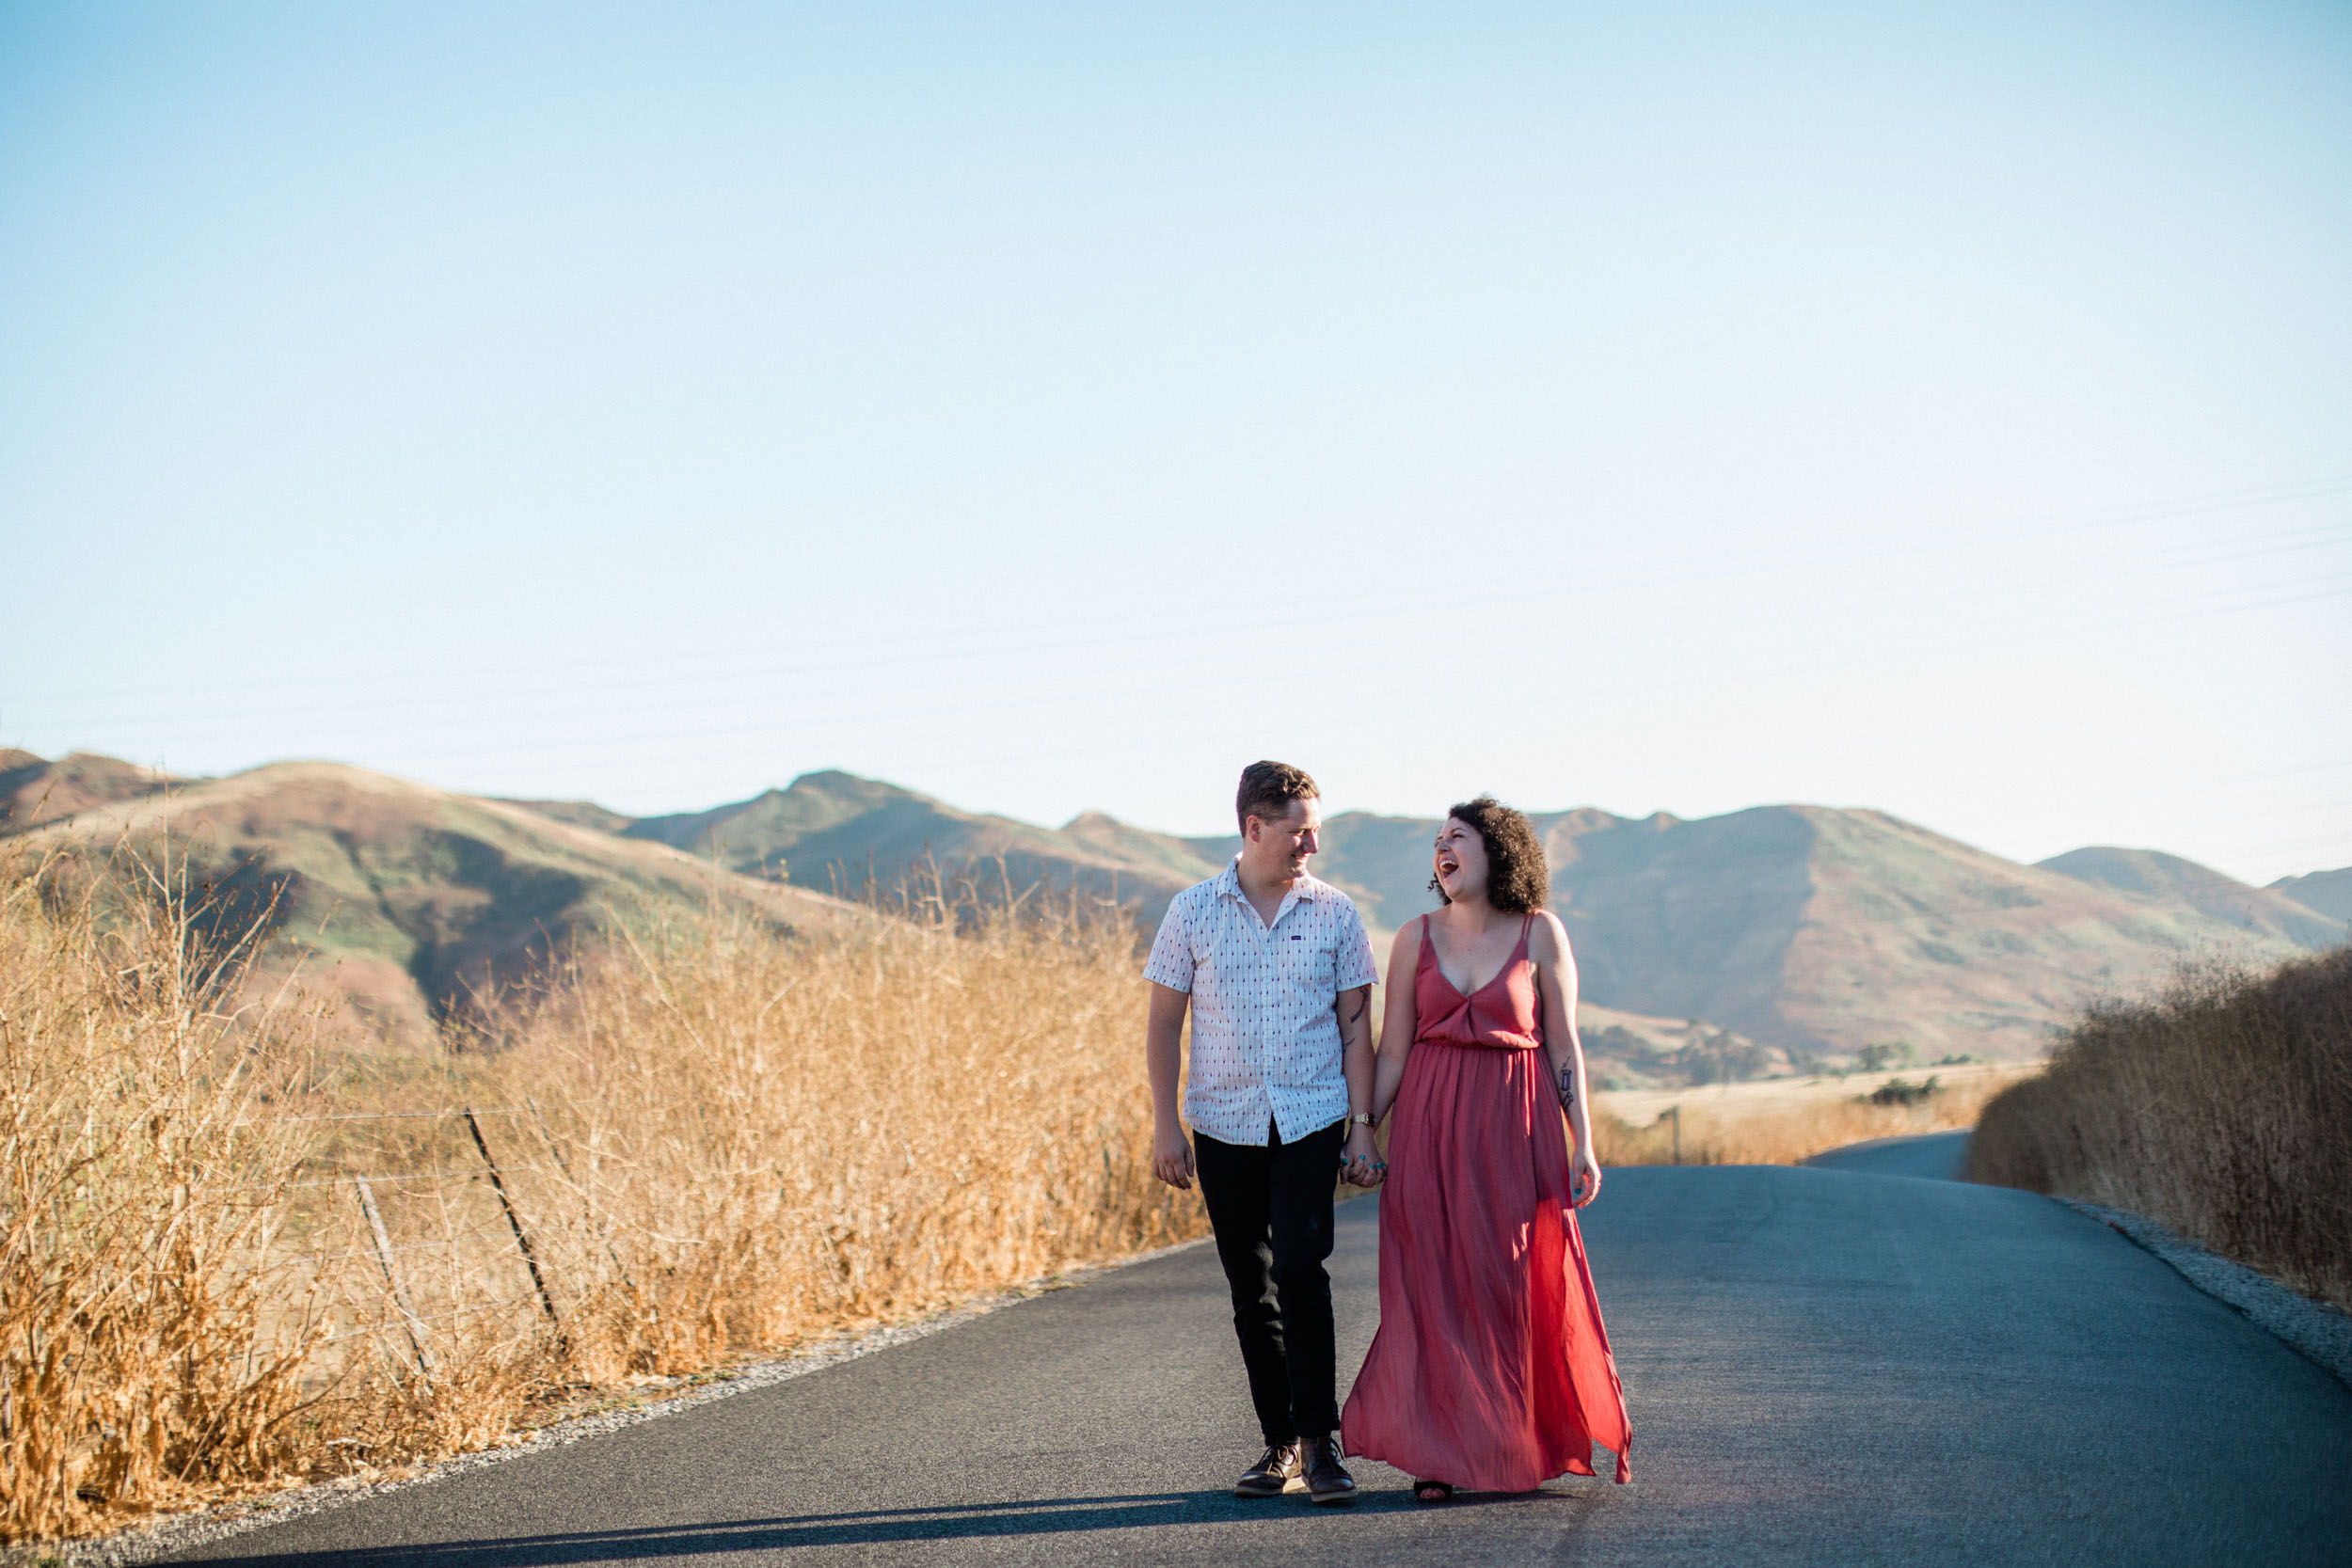 BKM-Photography-Ventura-Southern-California-Engagement-Wedding-0017.jpg